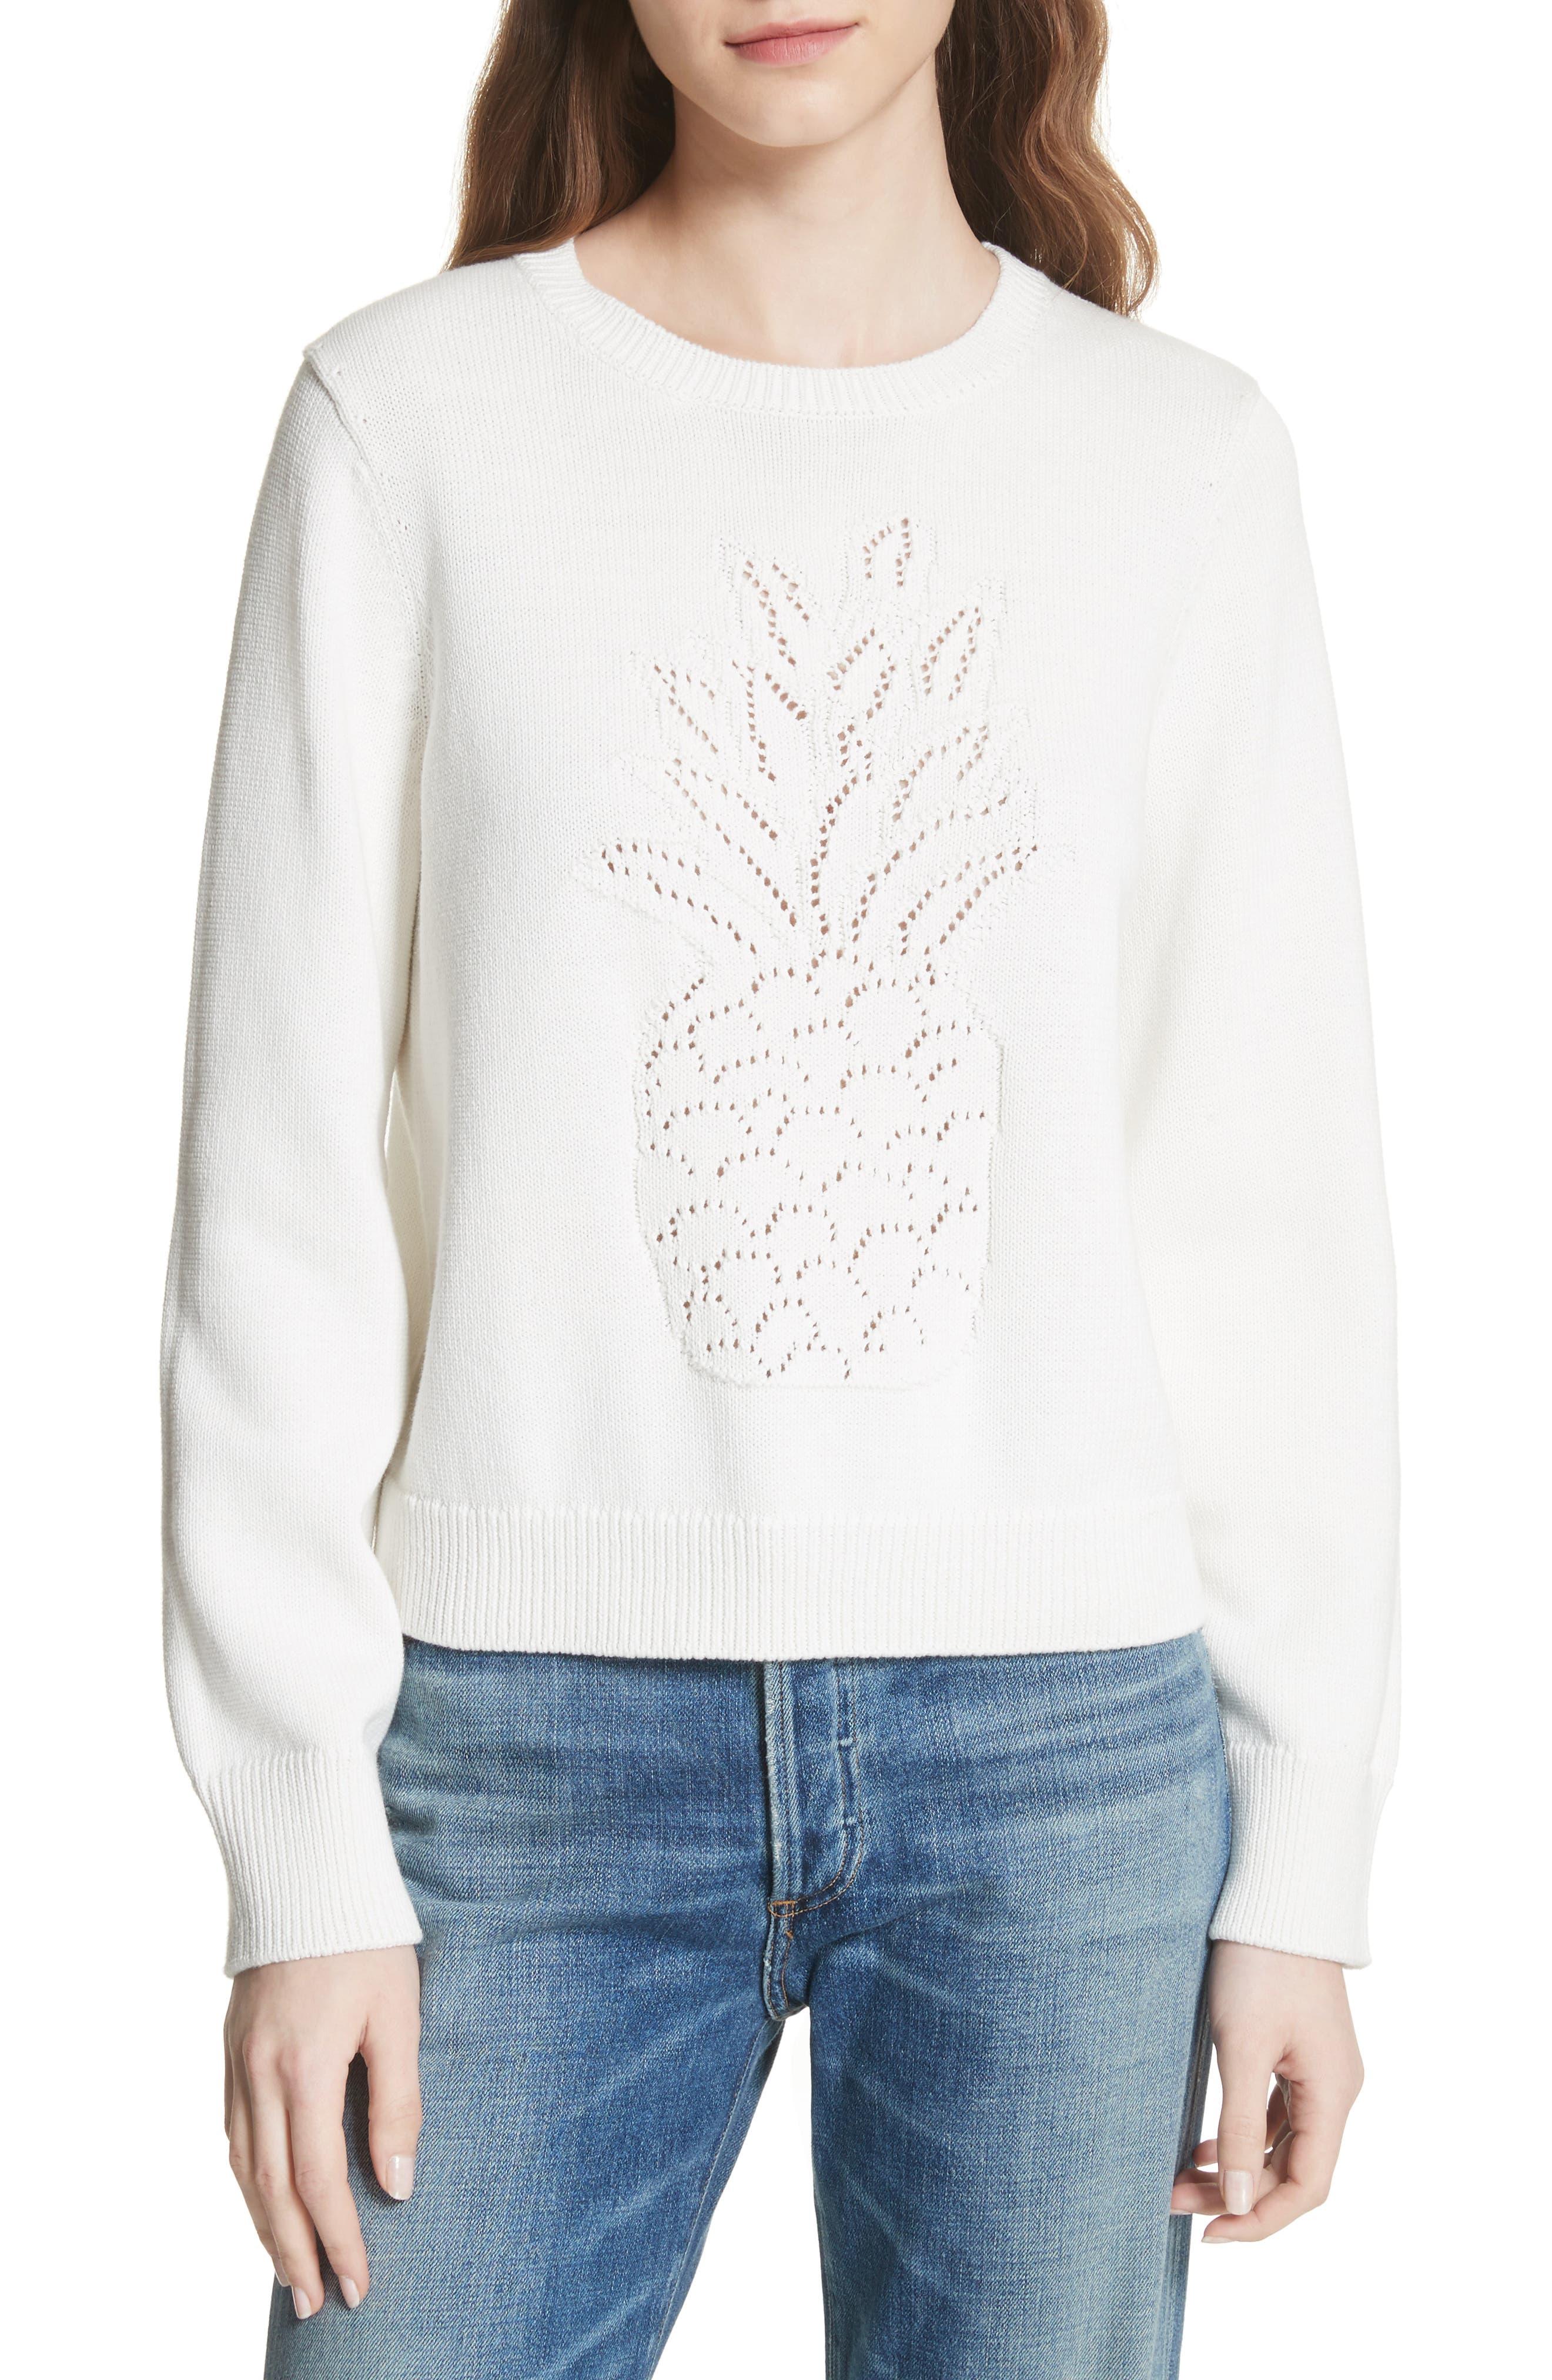 Barin Pineapple Cotton Sweater,                             Main thumbnail 1, color,                             Porcelain